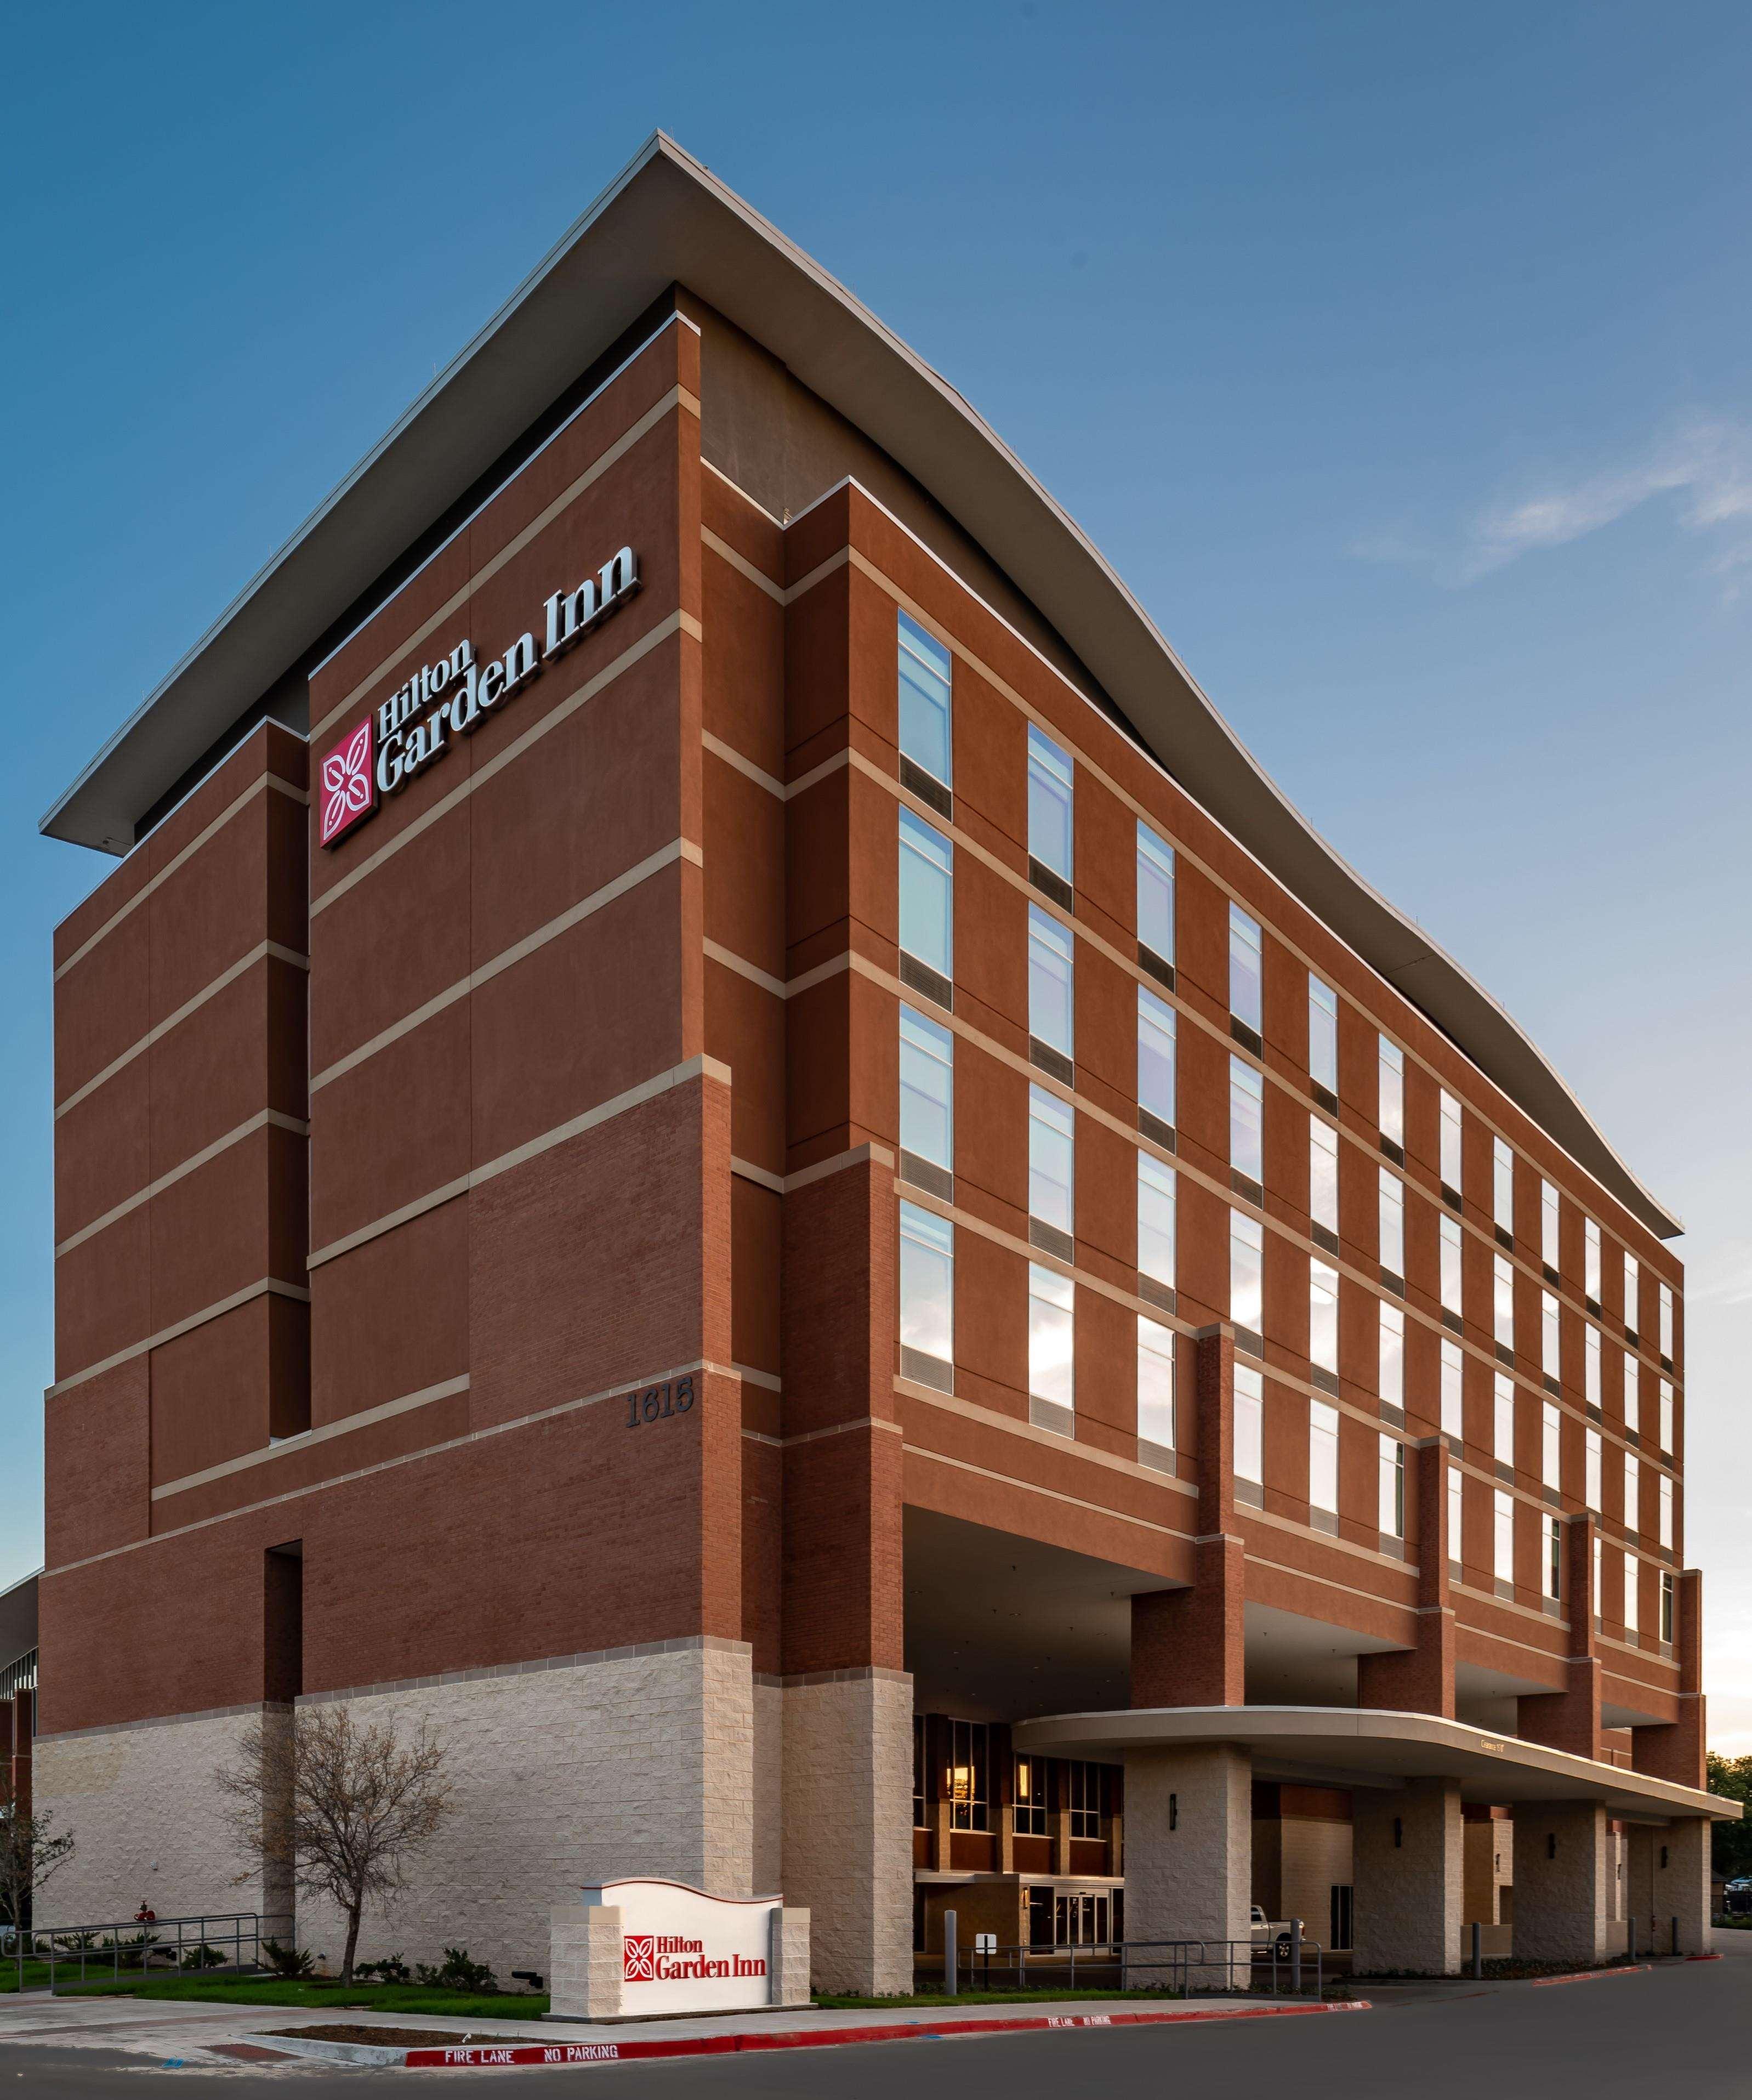 Hilton Garden Inn Dallas at Hurst Conference Center image 3